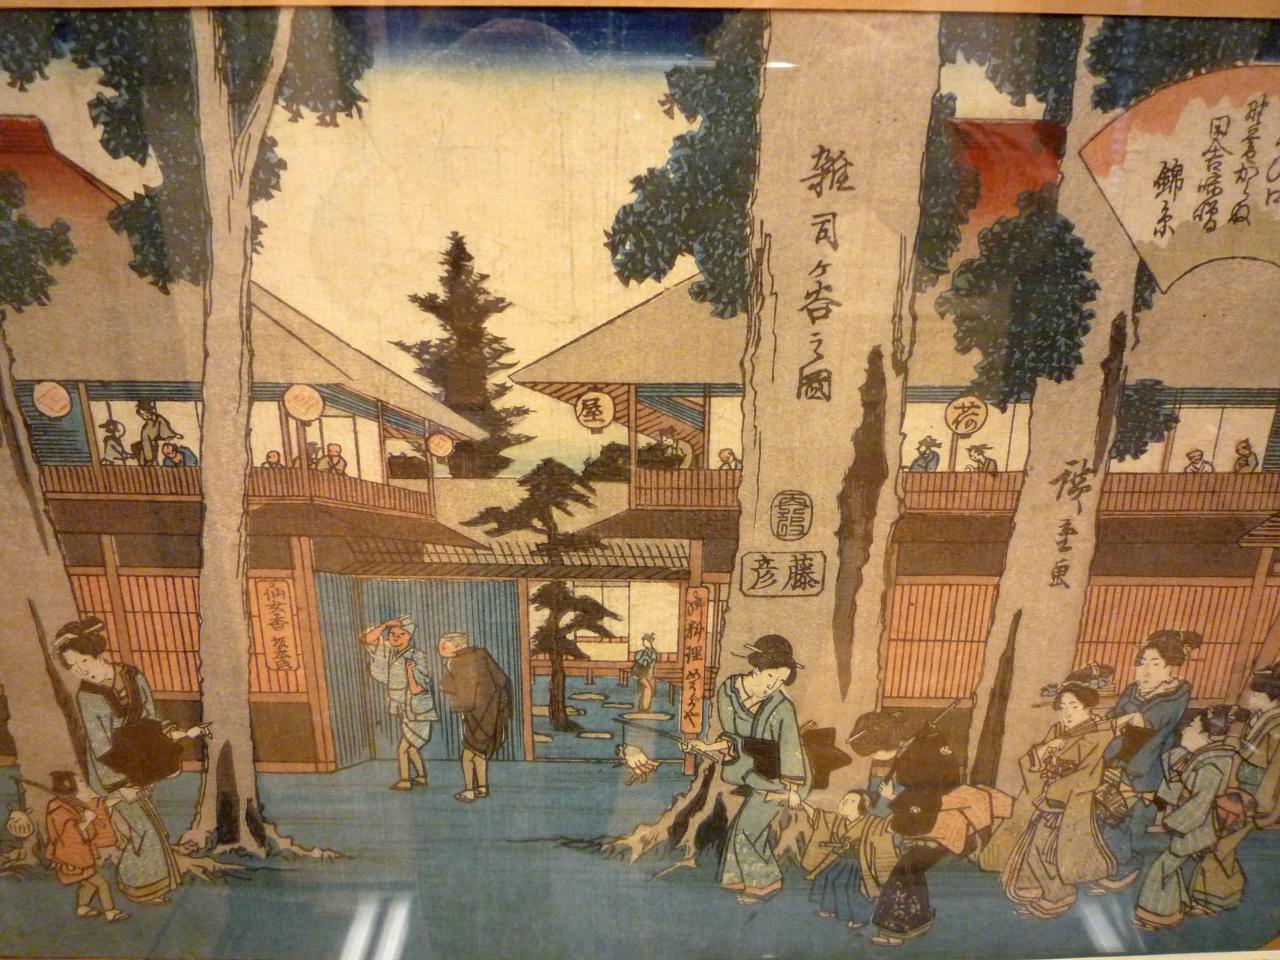 Utagawa Hiroshige, Japon, époque d'Edo